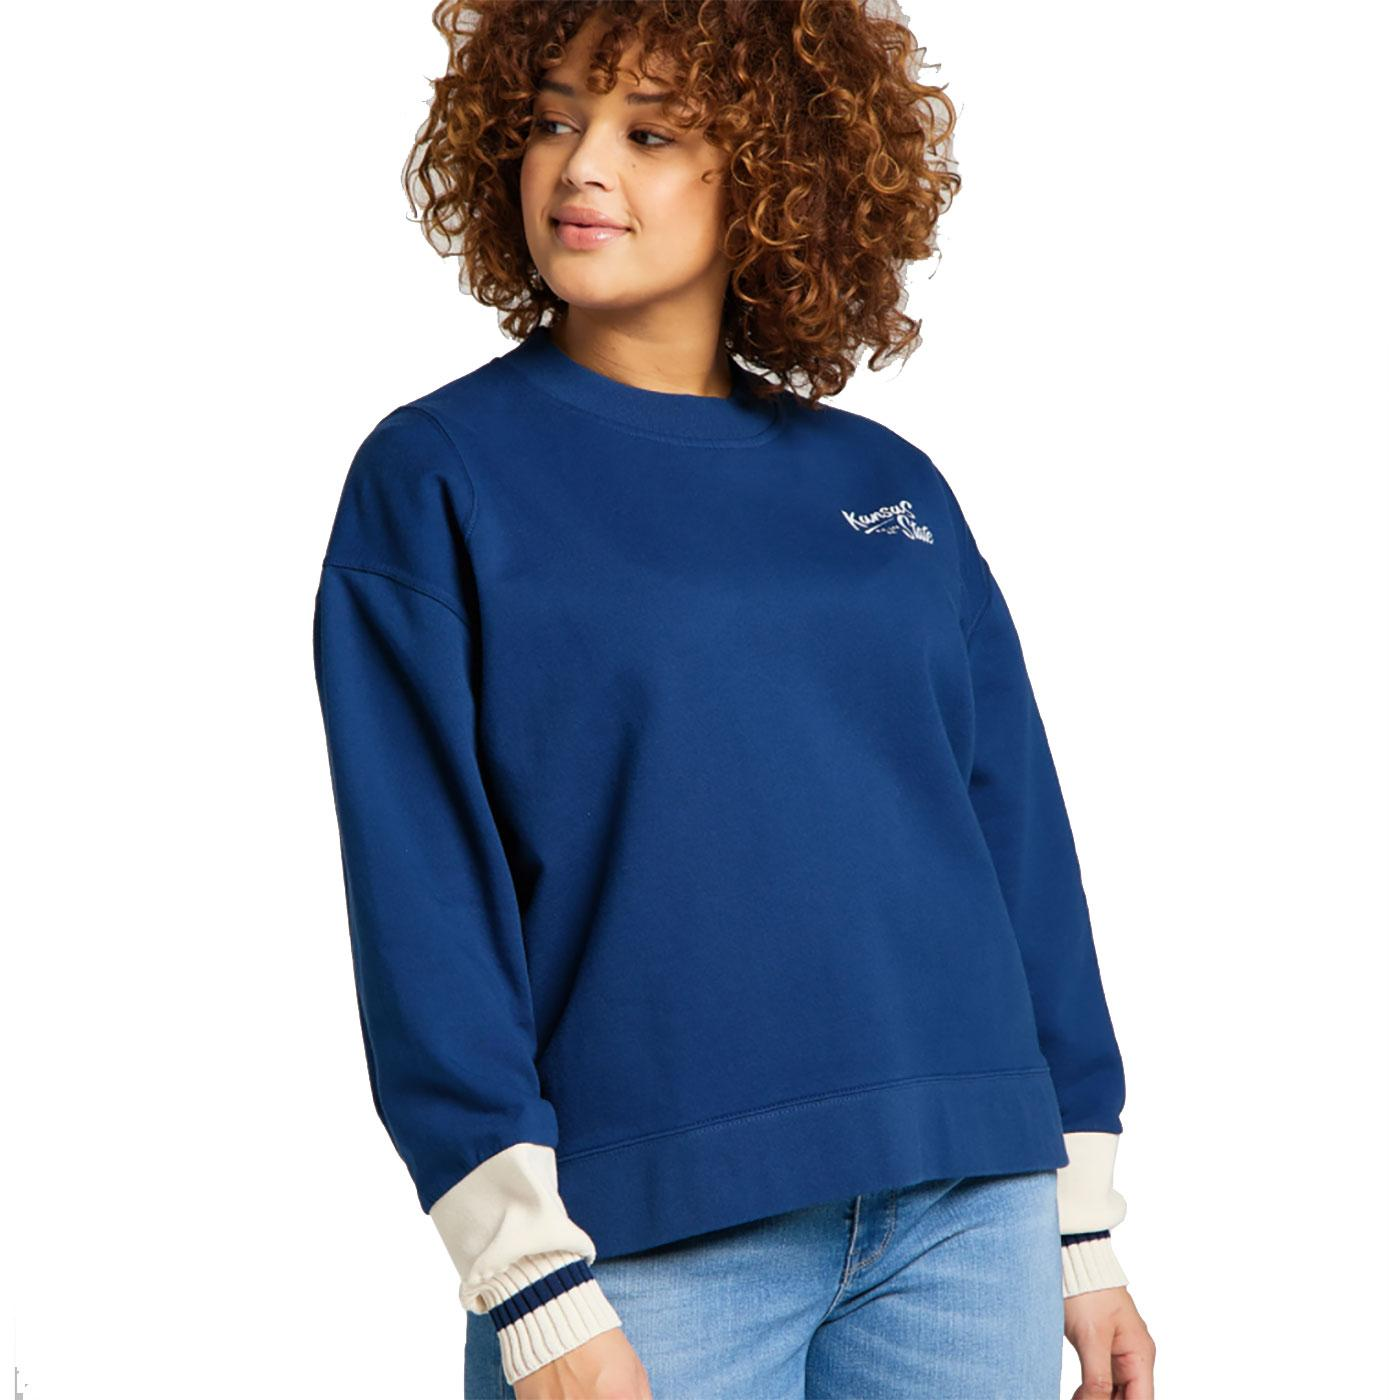 LEE JEANS Womens Cut & Sew Raglan Sweatshirt WB